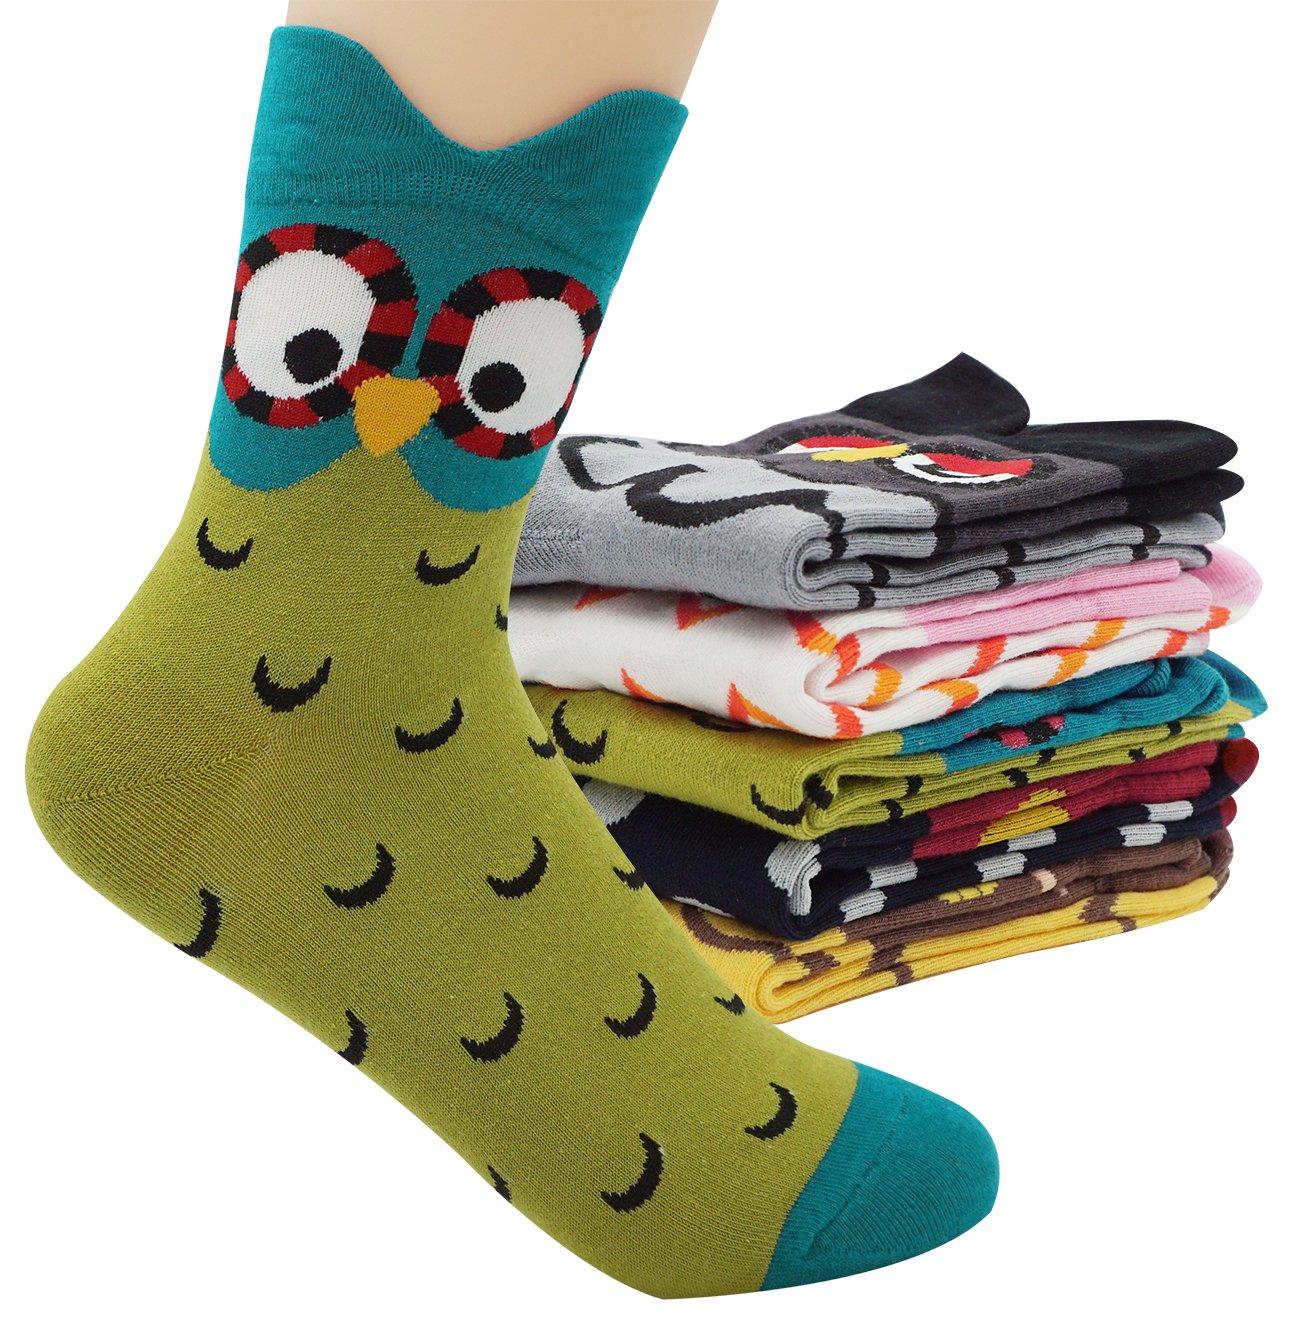 Women's Lady's Cute Owl Design Cotton Socks,5 Pairs Multi Color One Size by Bienvenu (Image #6)